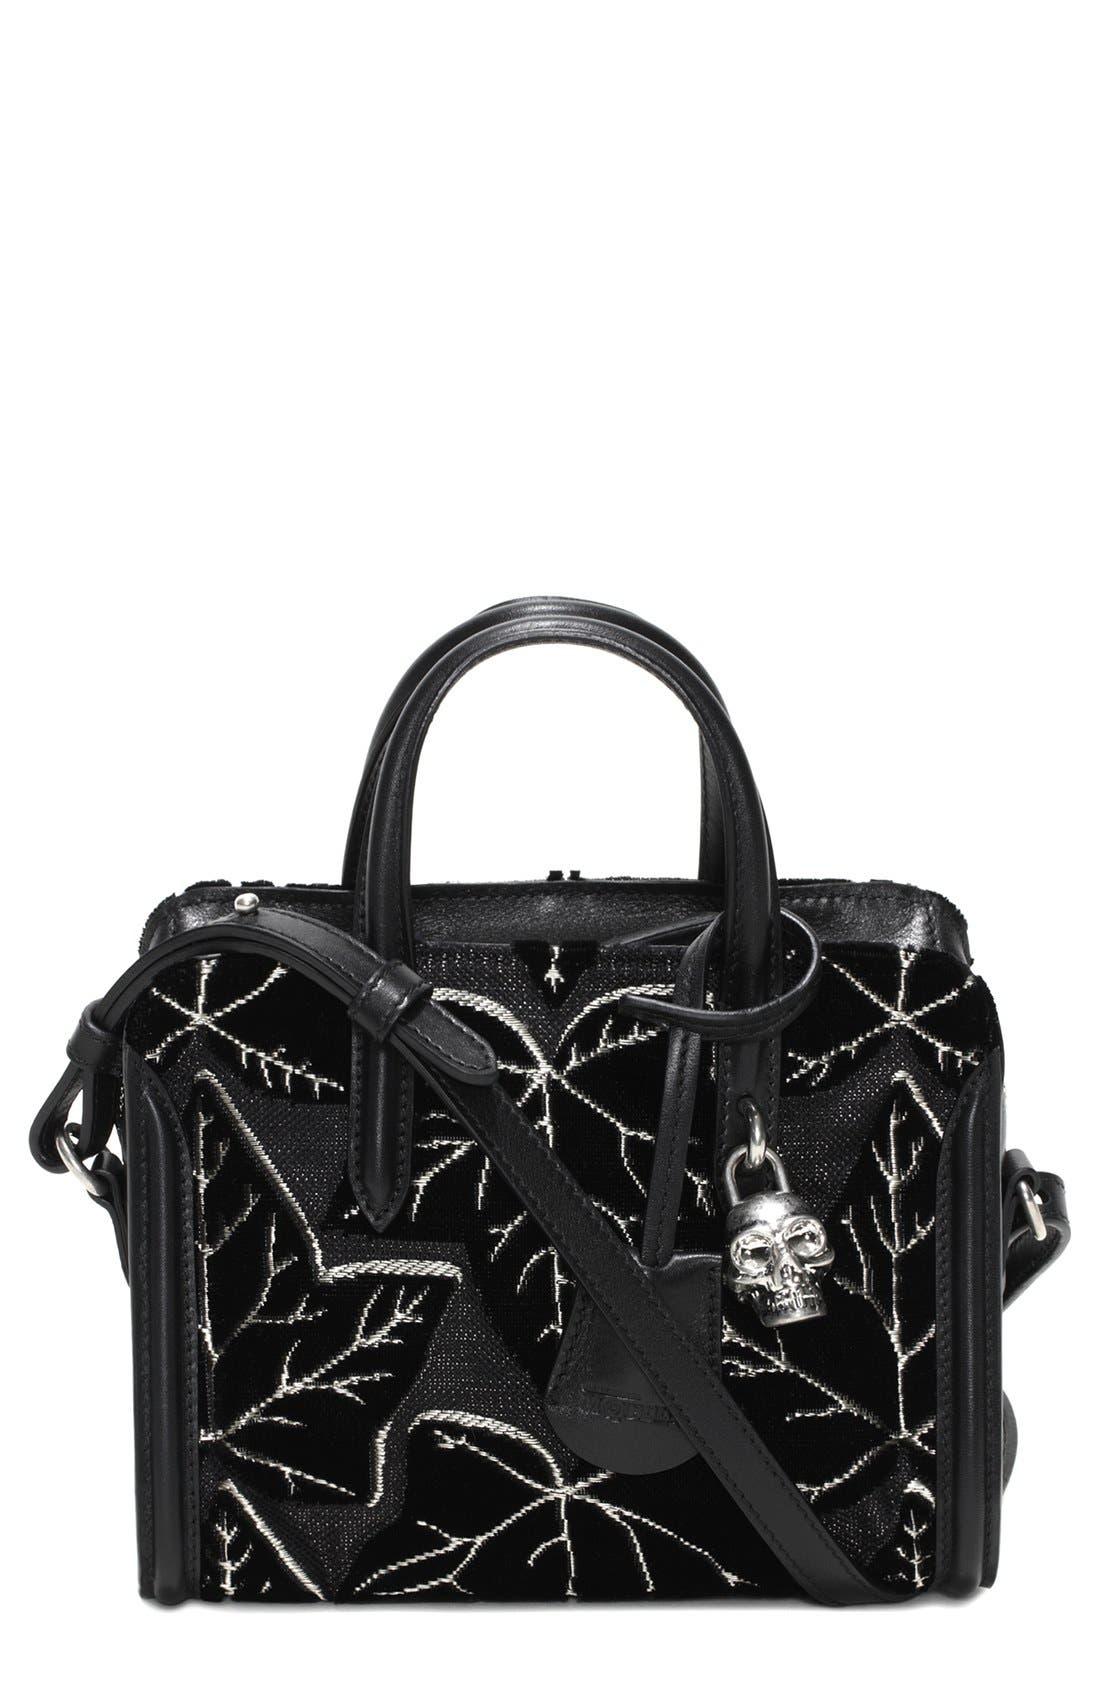 Main Image - Alexander McQueen 'Mini Padlock' Velvet Duffel Bag